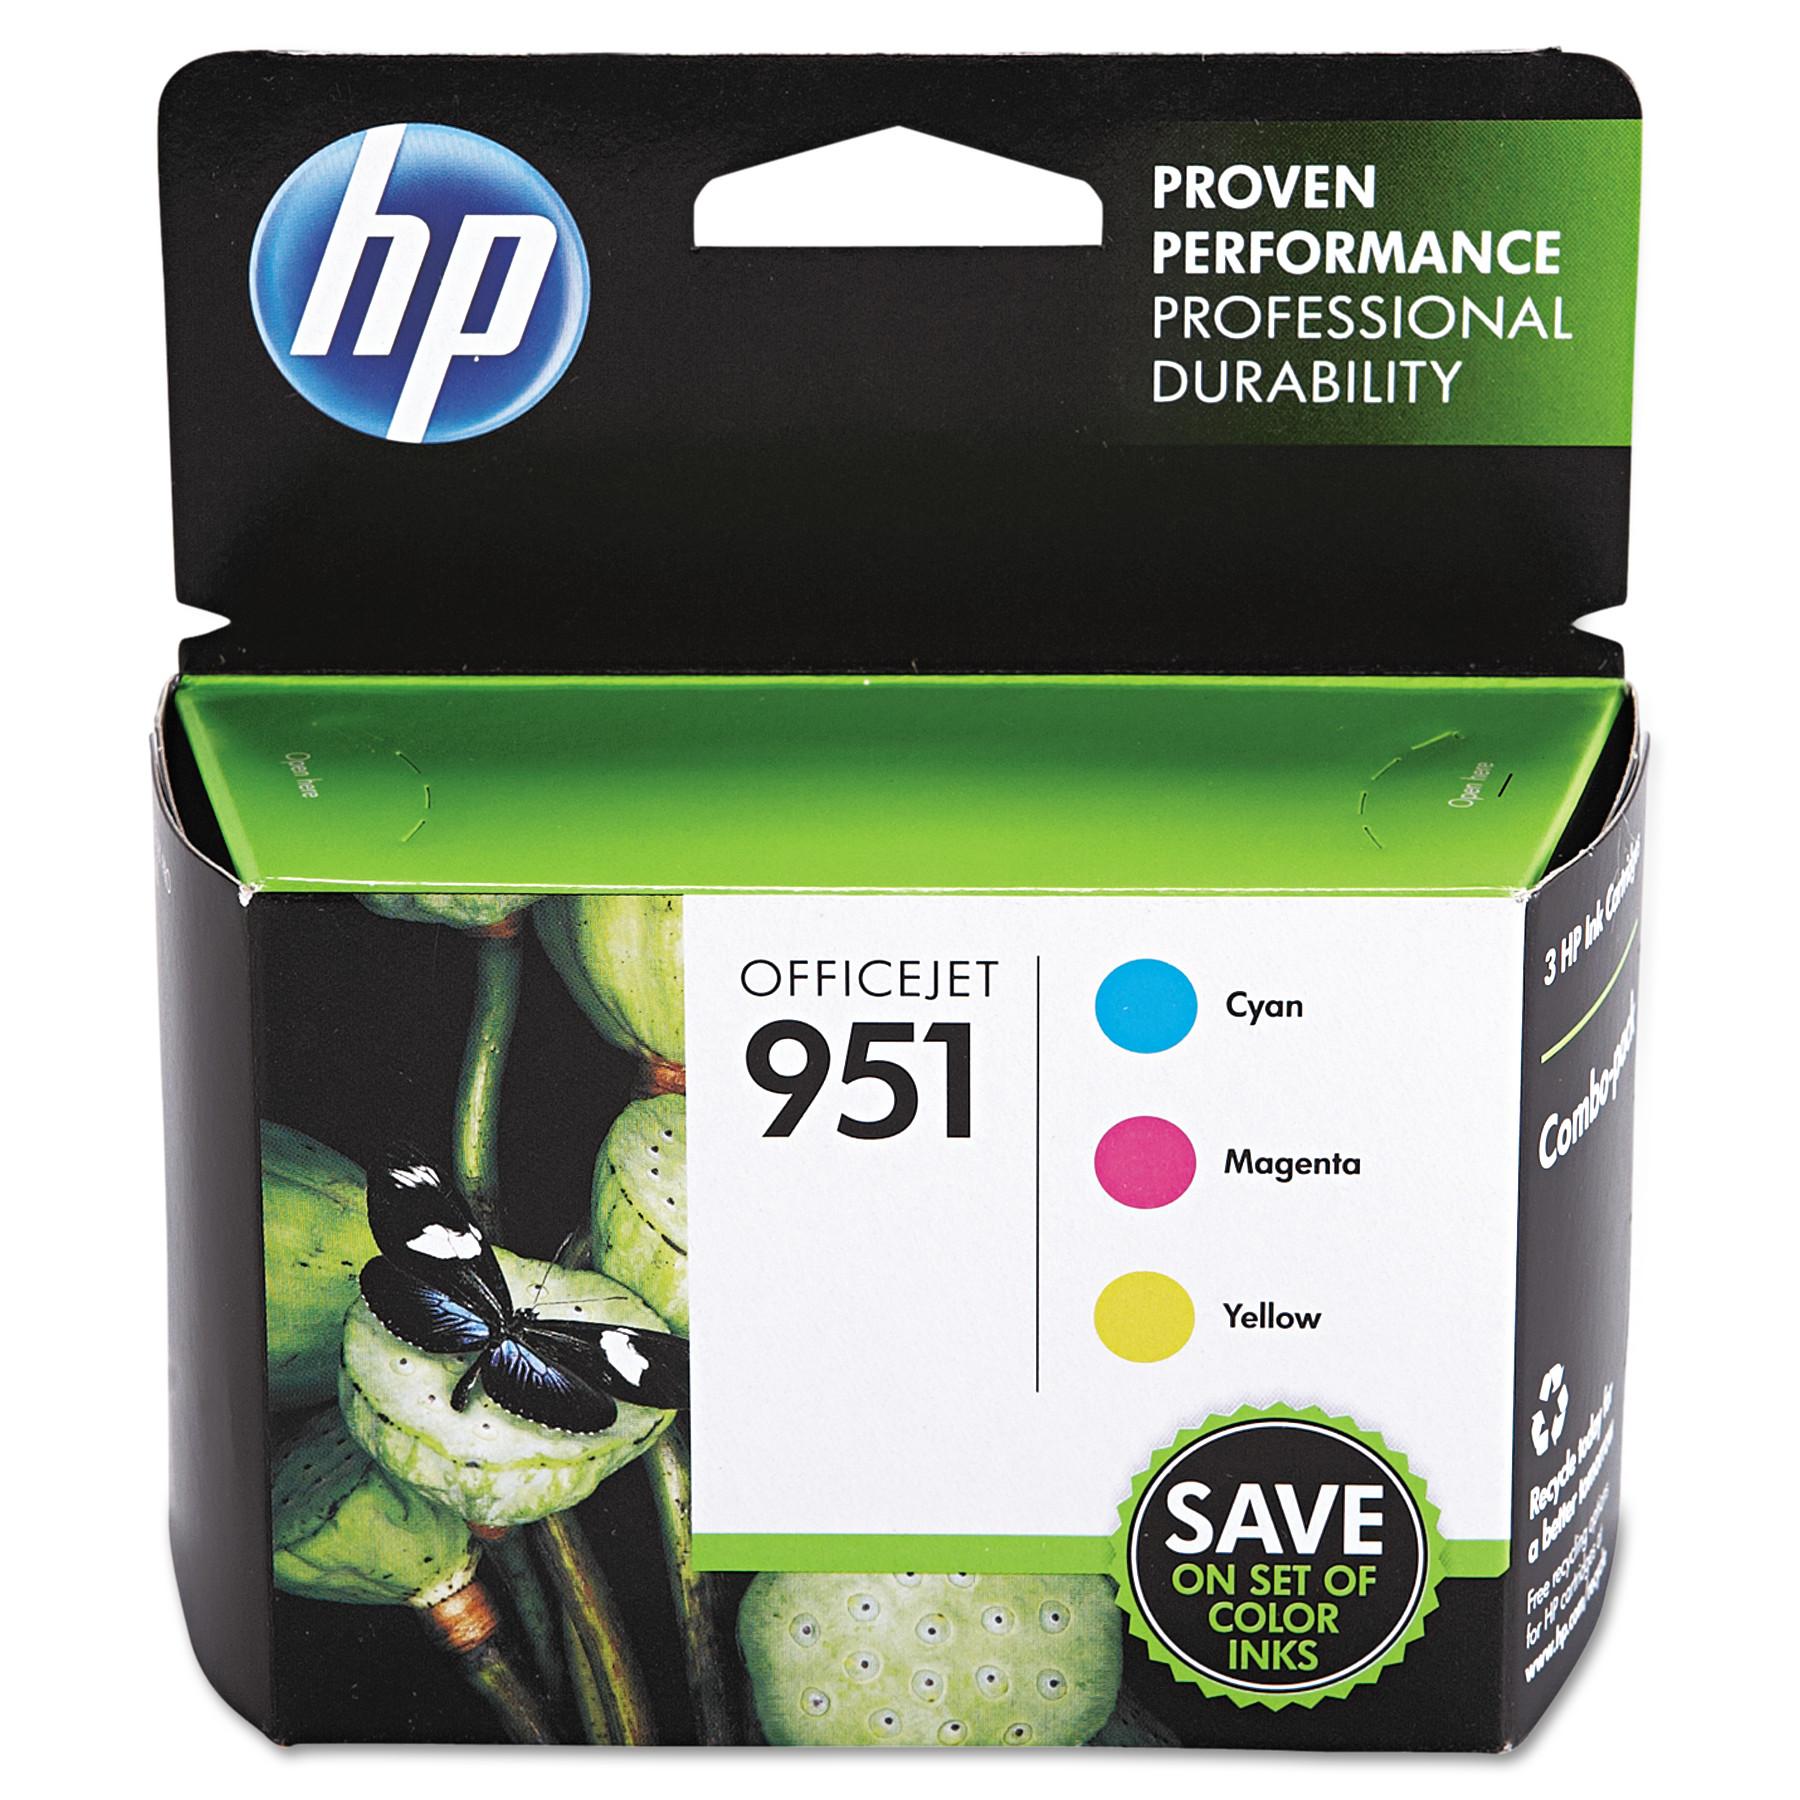 HP HP 951, (CR314FN) 3-pack Cyan Magenta Yellow Original Ink Cartridges by HP